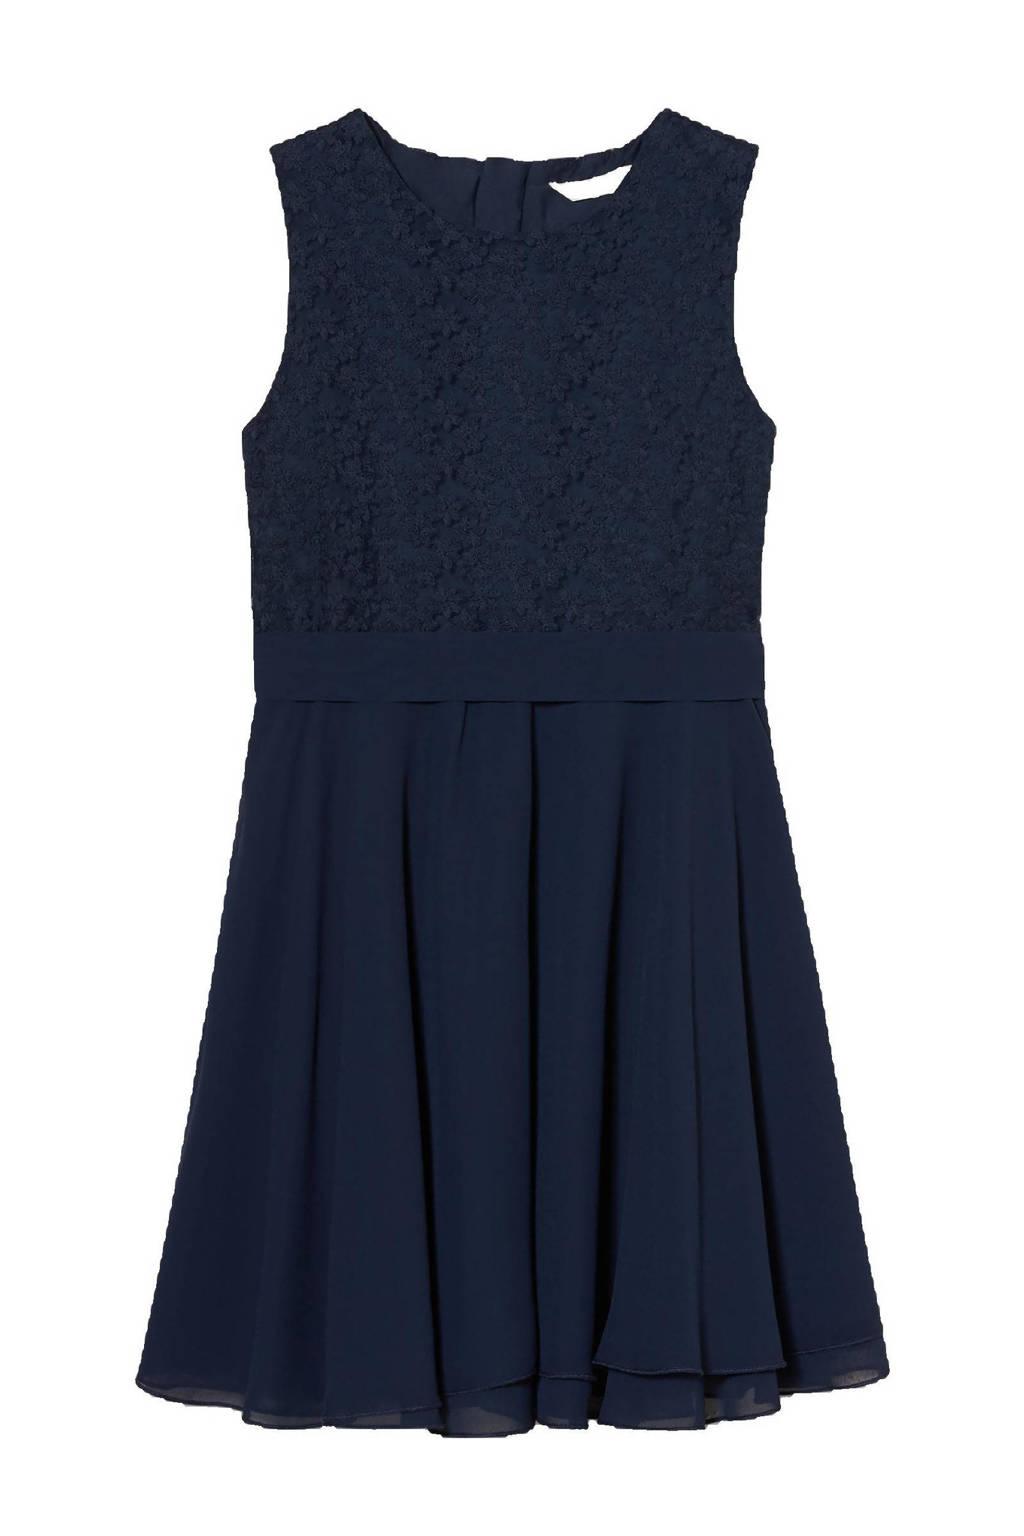 C&A jurk met kant donkerblauw, Donkerblauw